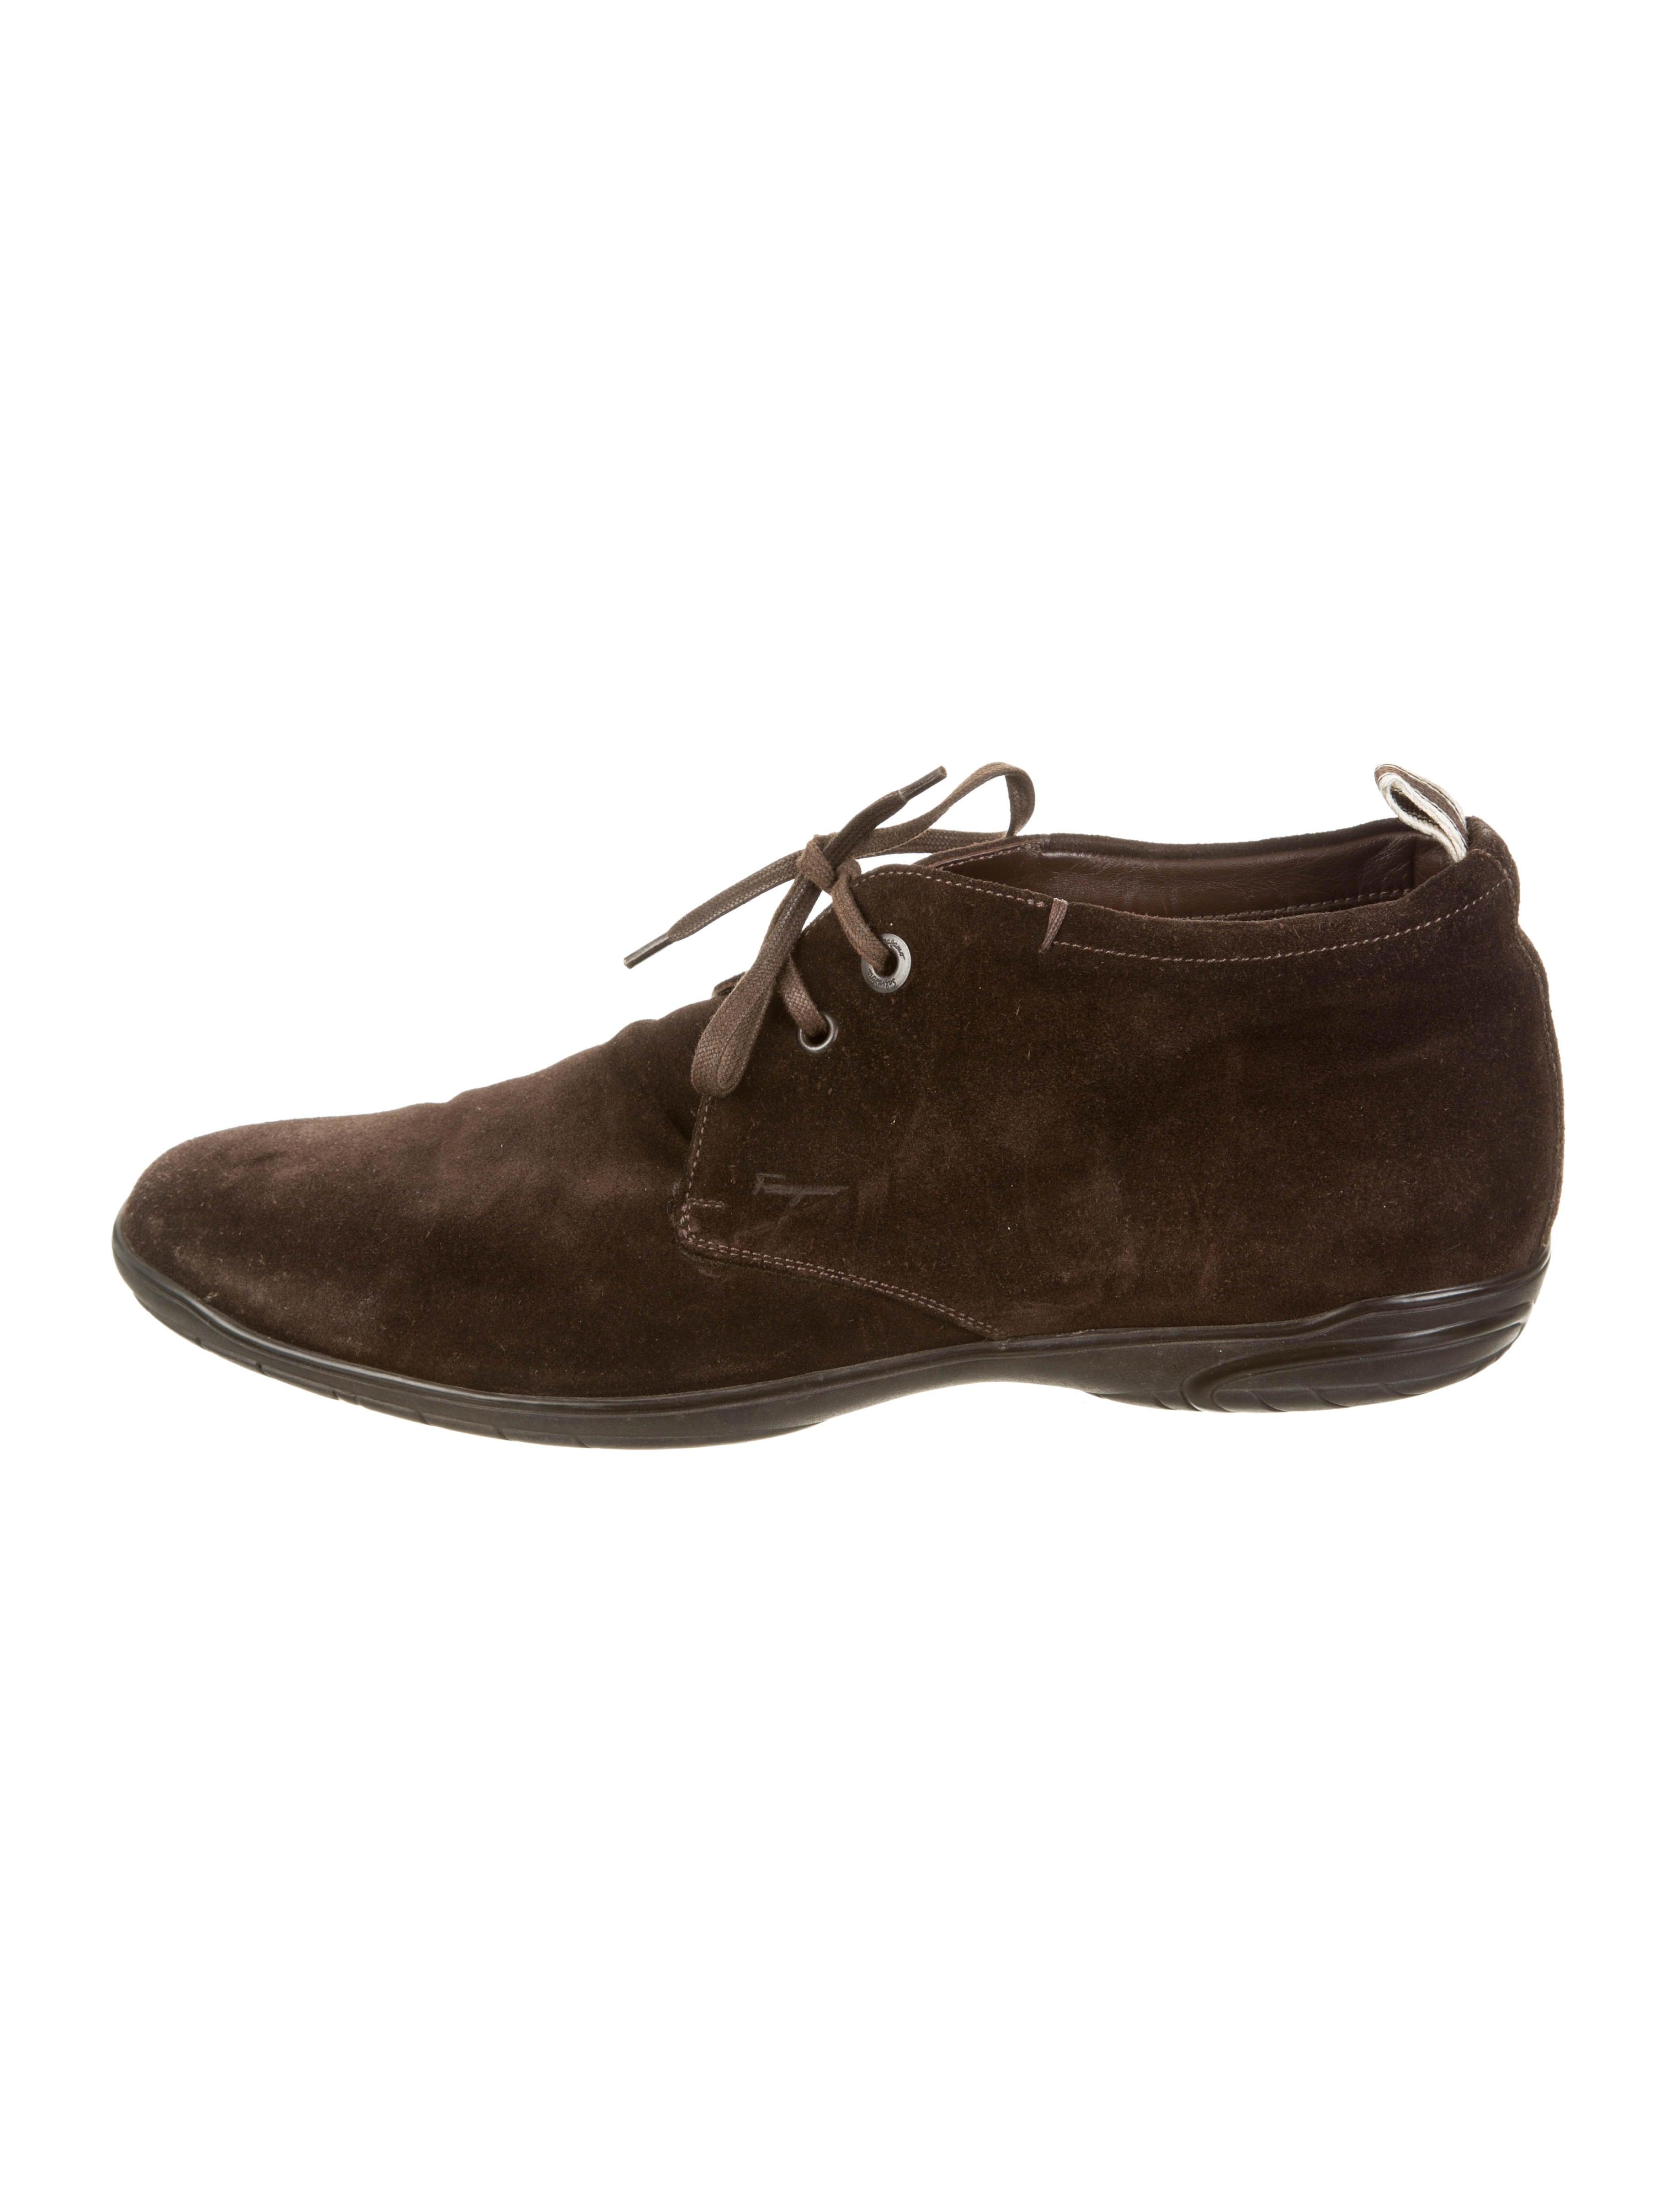 salvatore ferragamo chukka boots shoes sal26058 the